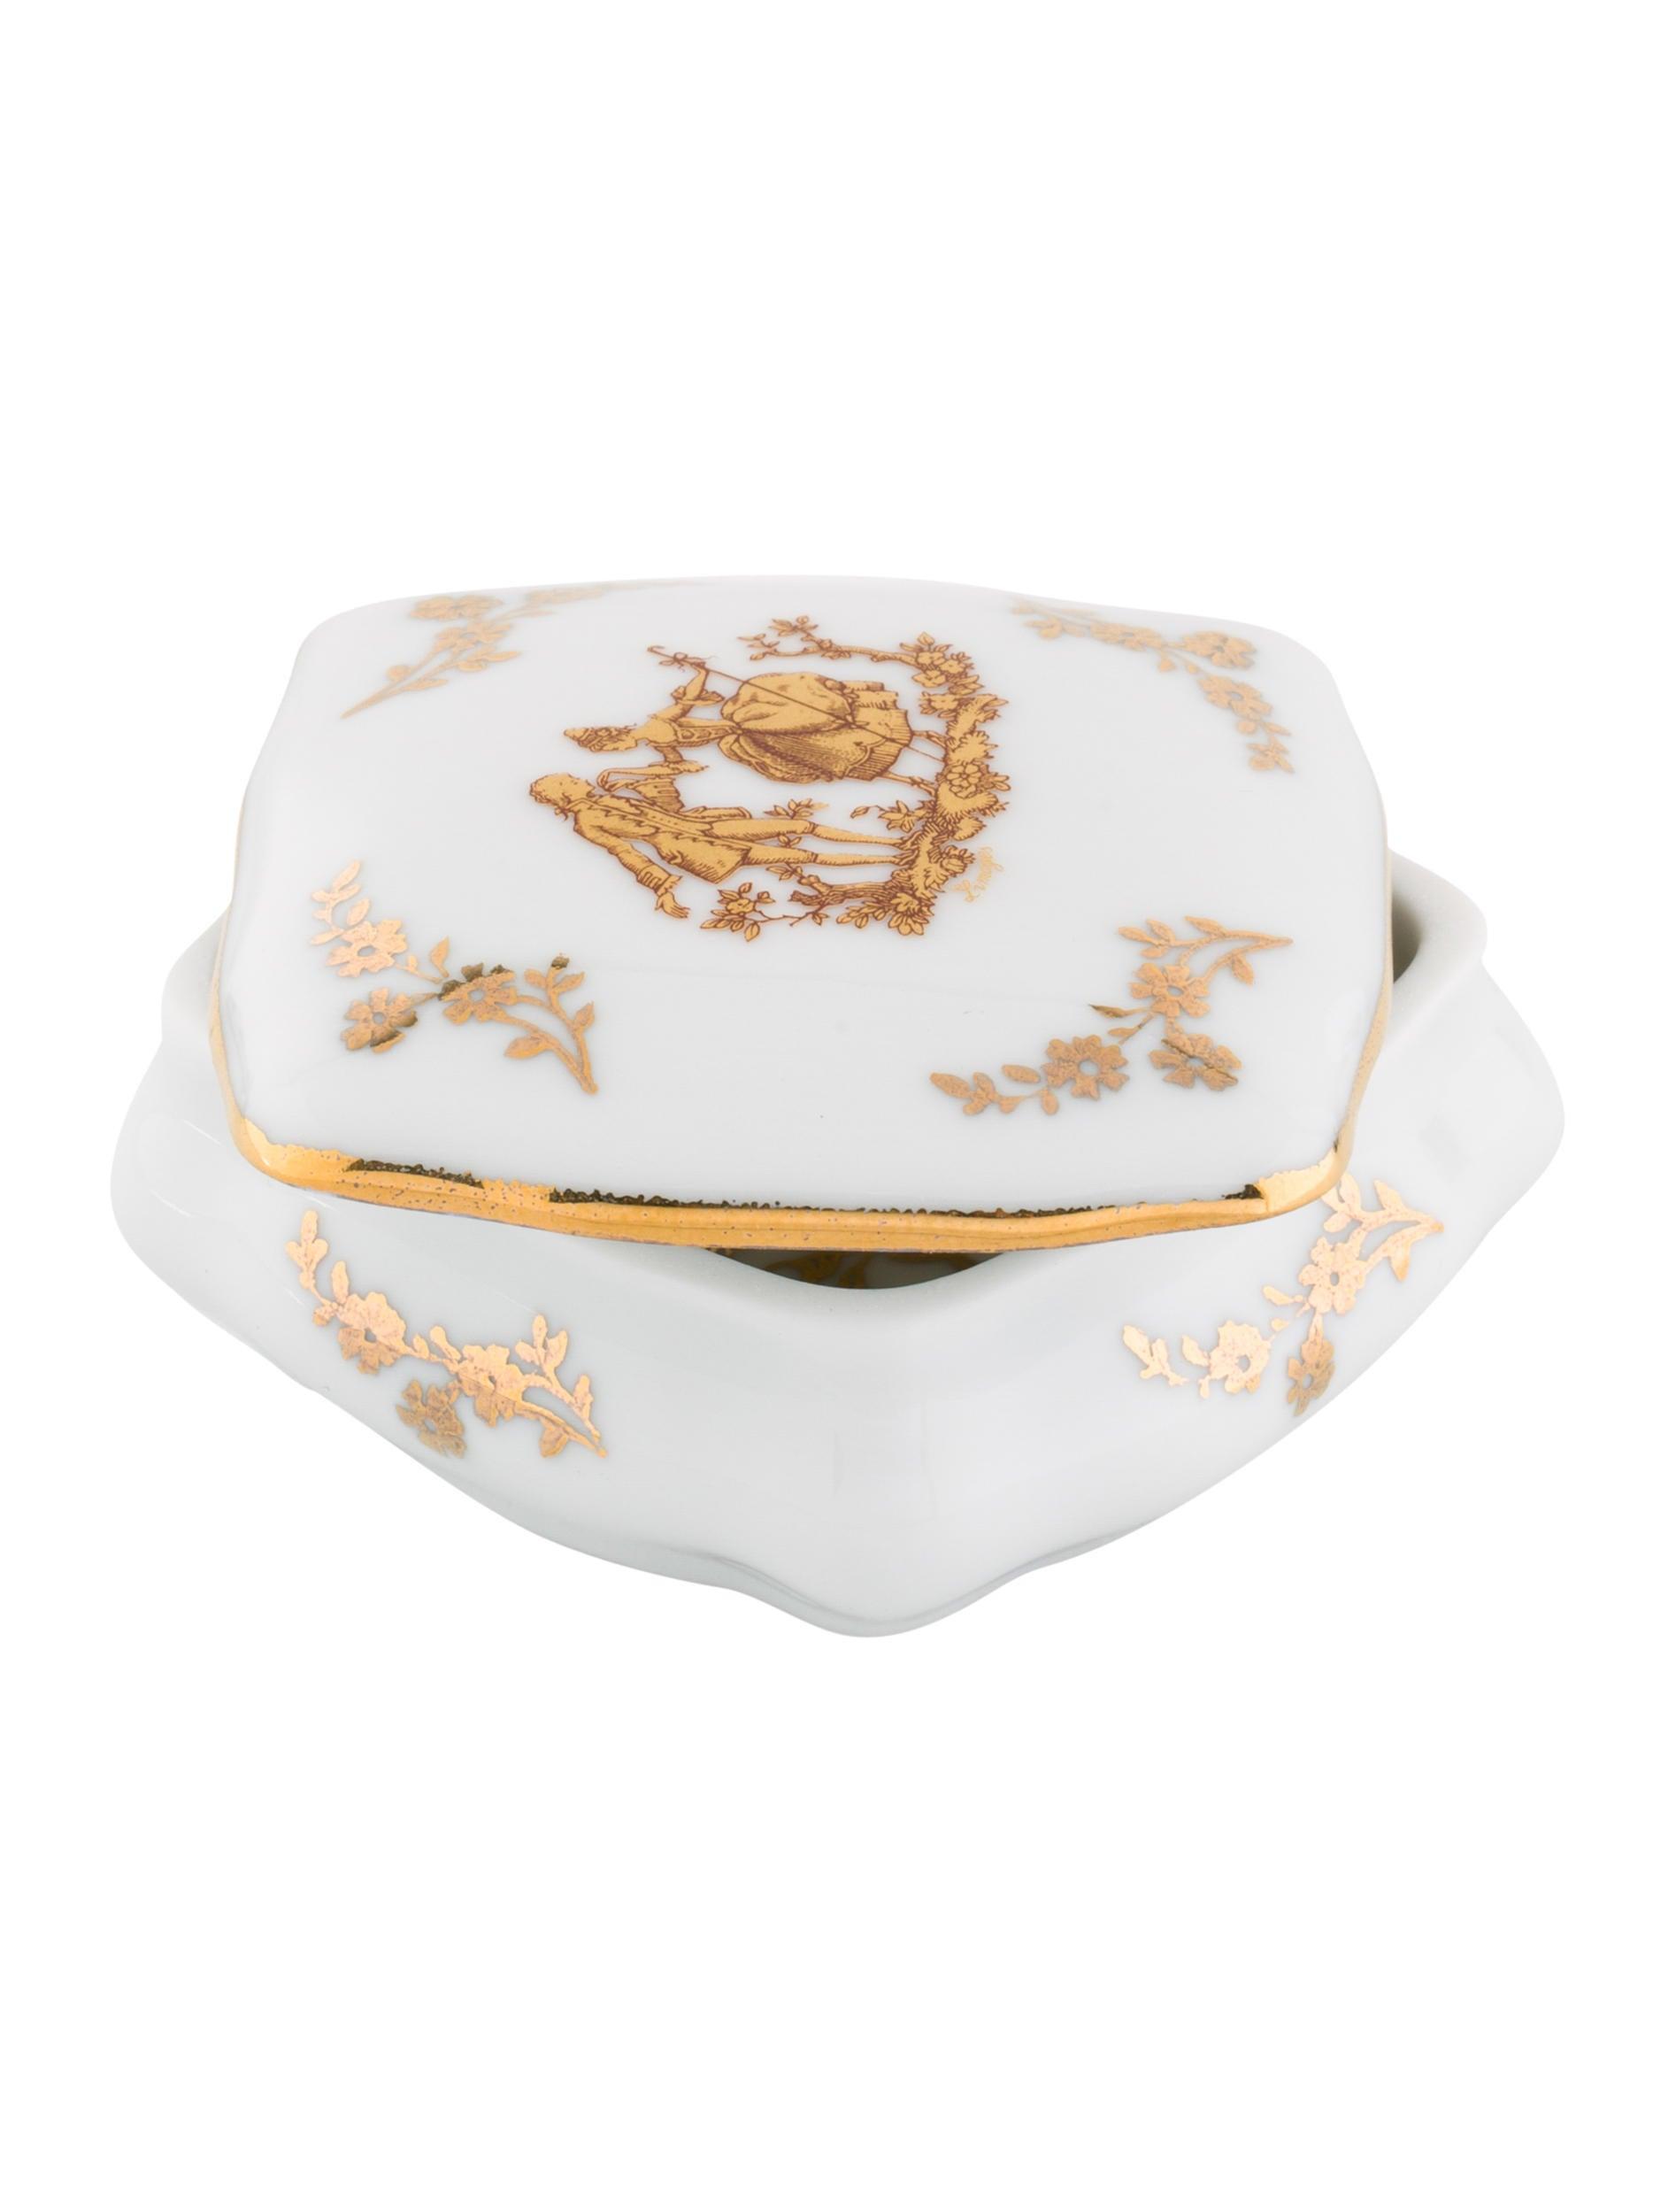 limoges porcelain box decor and accessories lim21162. Black Bedroom Furniture Sets. Home Design Ideas